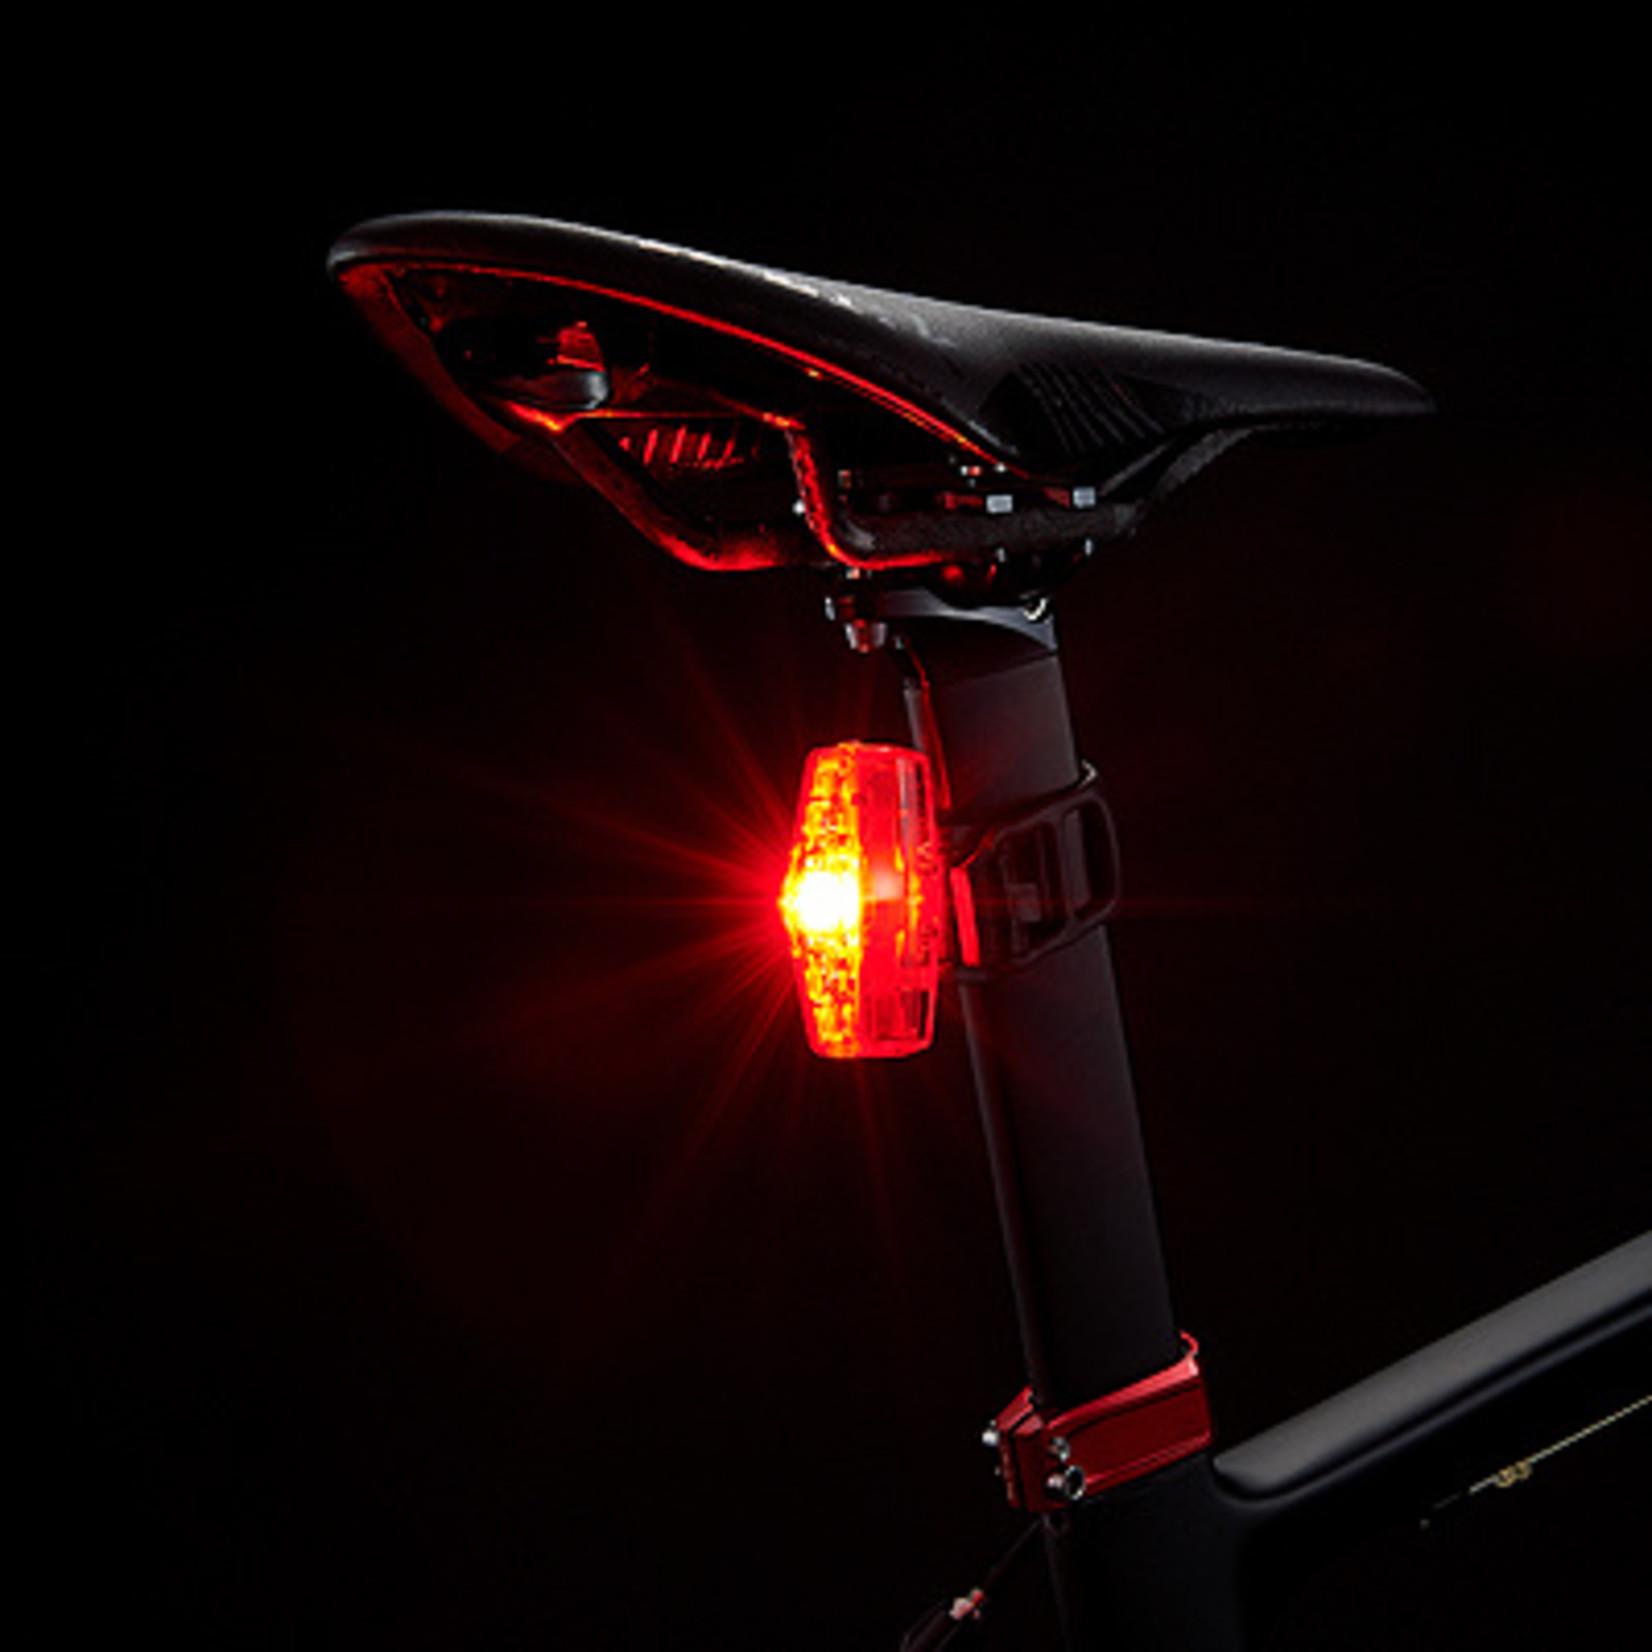 CATEYE VIZ 150 REAR LIGHT